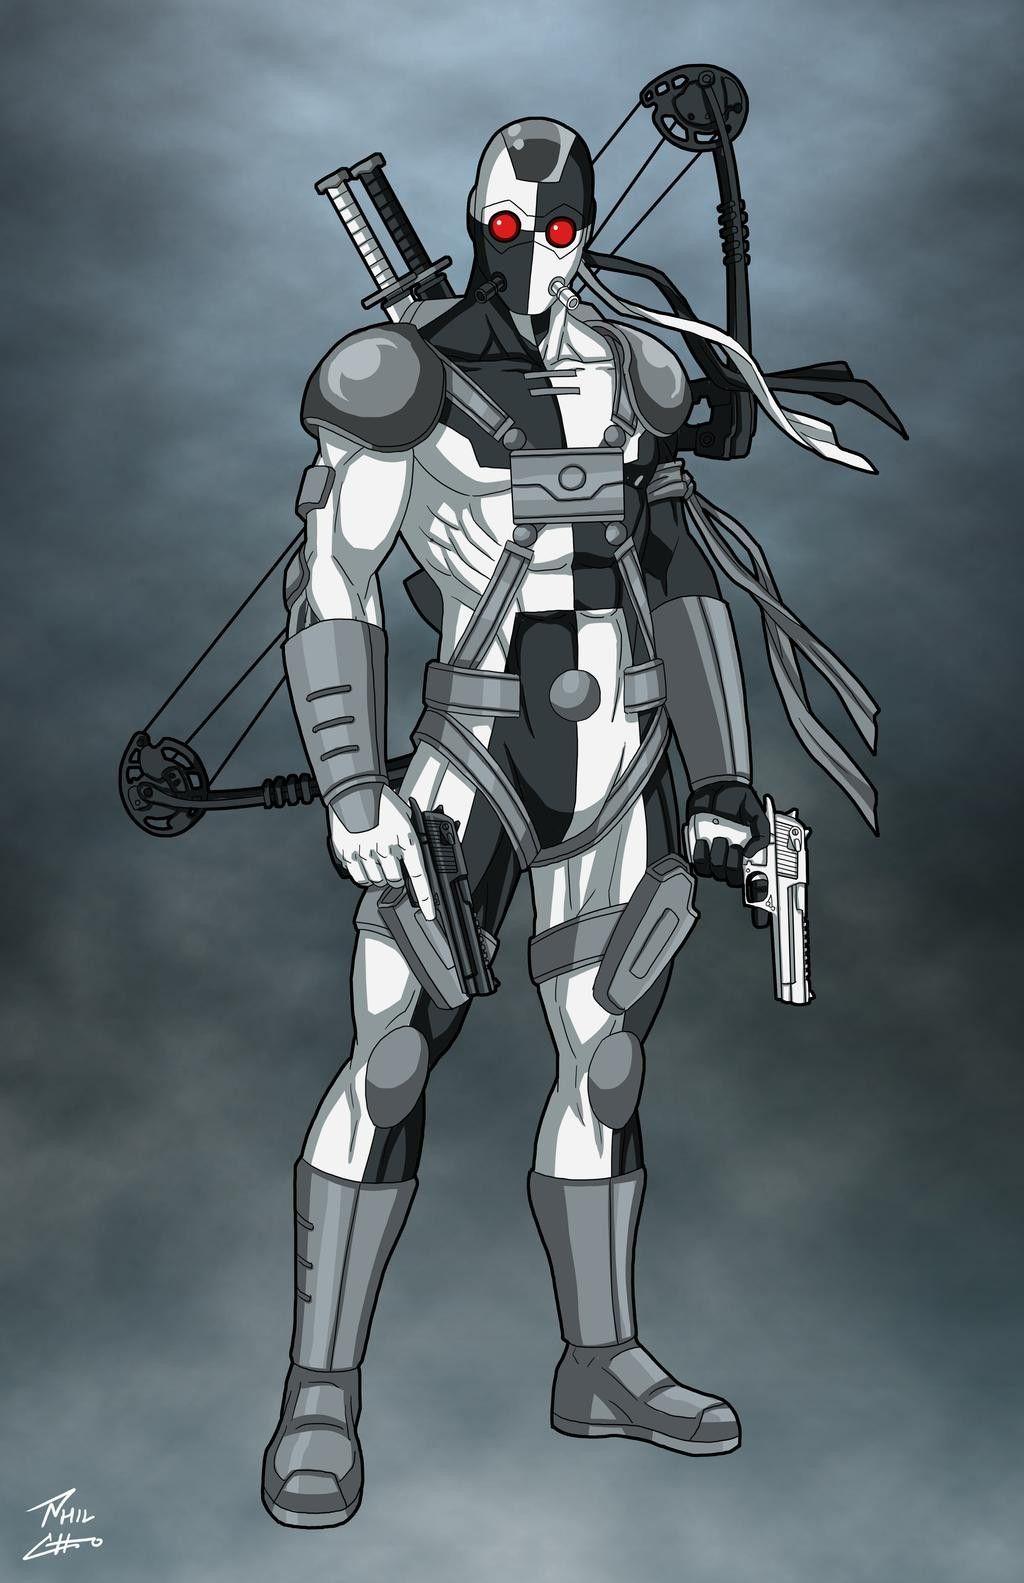 Pin By Alum On Suits Villain Character Superhero Art Superhero Characters